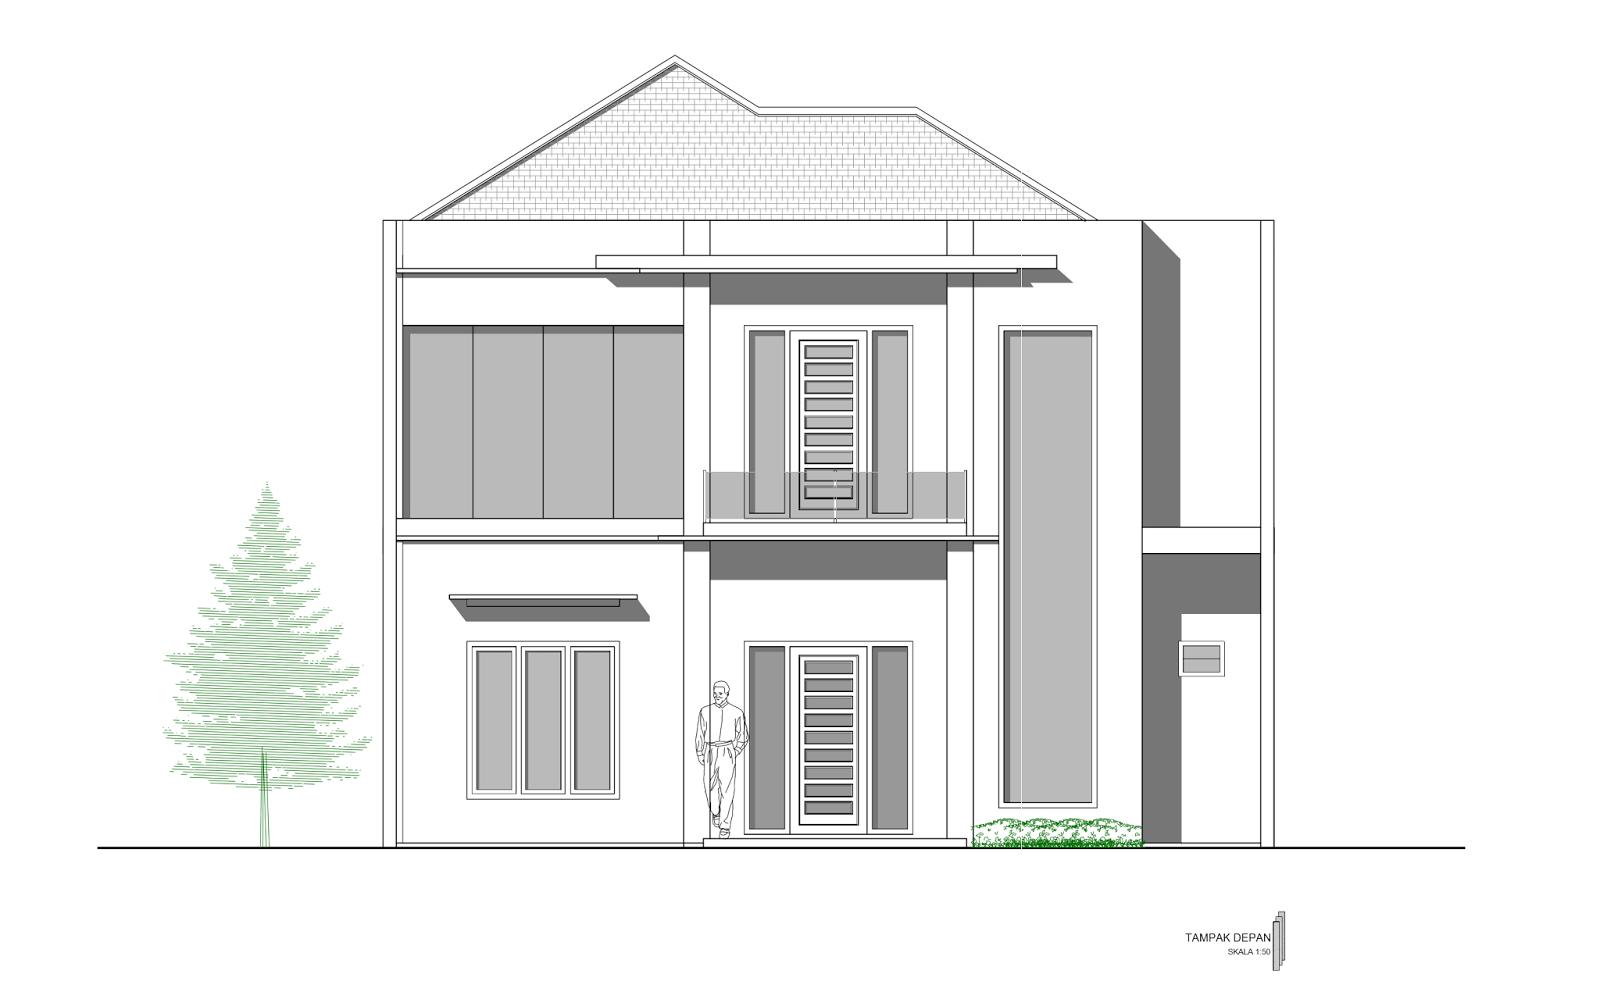 Denah Rumah 3 Lantai Autocad download gambar autocad